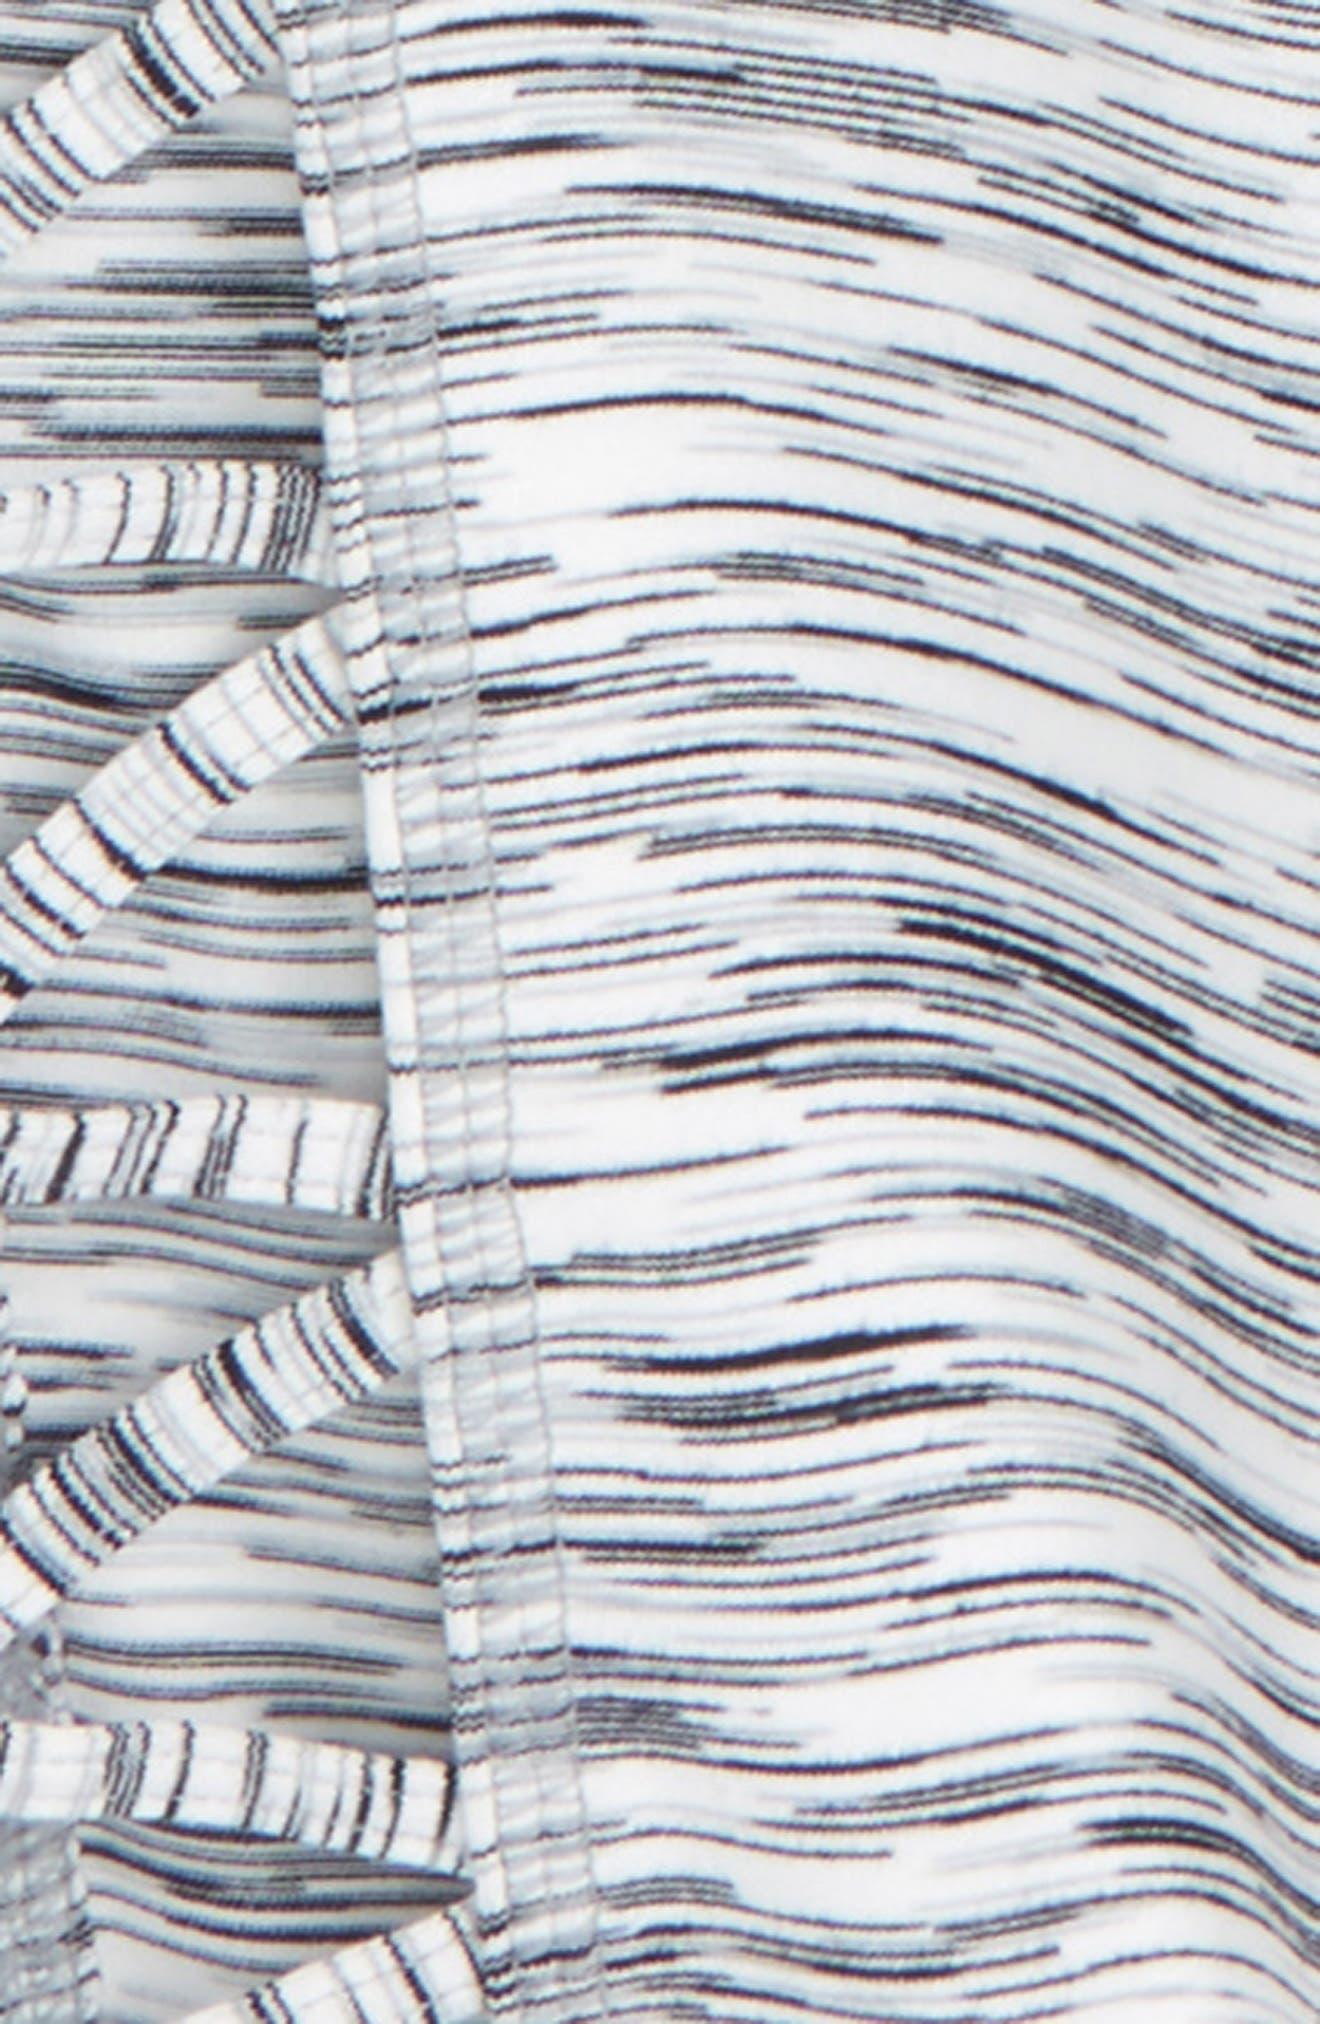 High Waist Lattice Crop Leggings,                             Alternate thumbnail 2, color,                             White Eclipse Spacedye